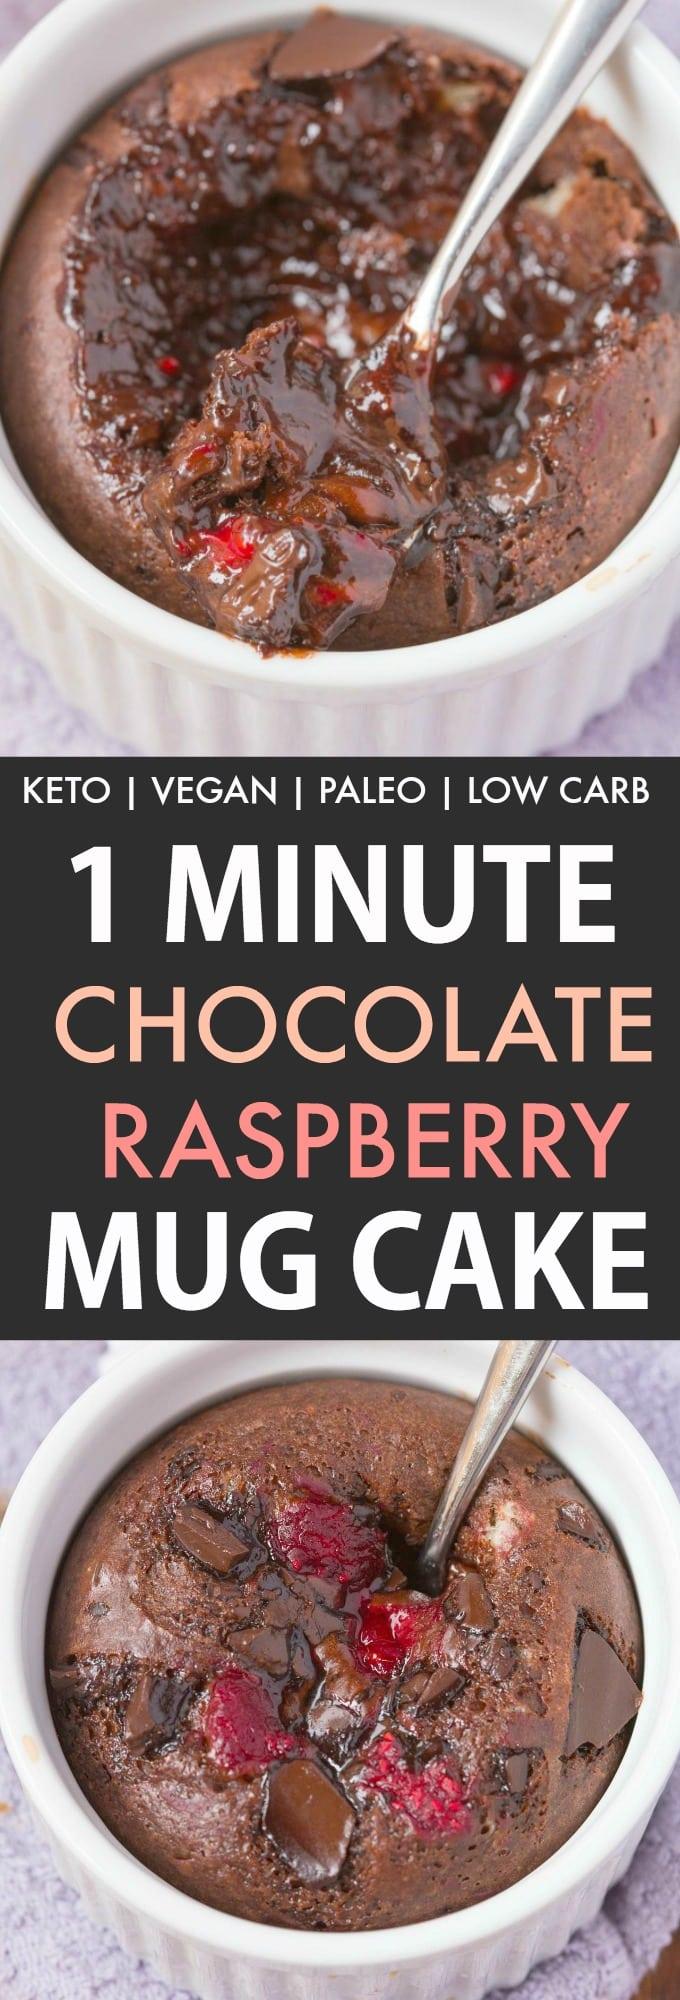 A single serve keto chocolate raspberry mug cake loaded with raspberries and chocolate chunks.